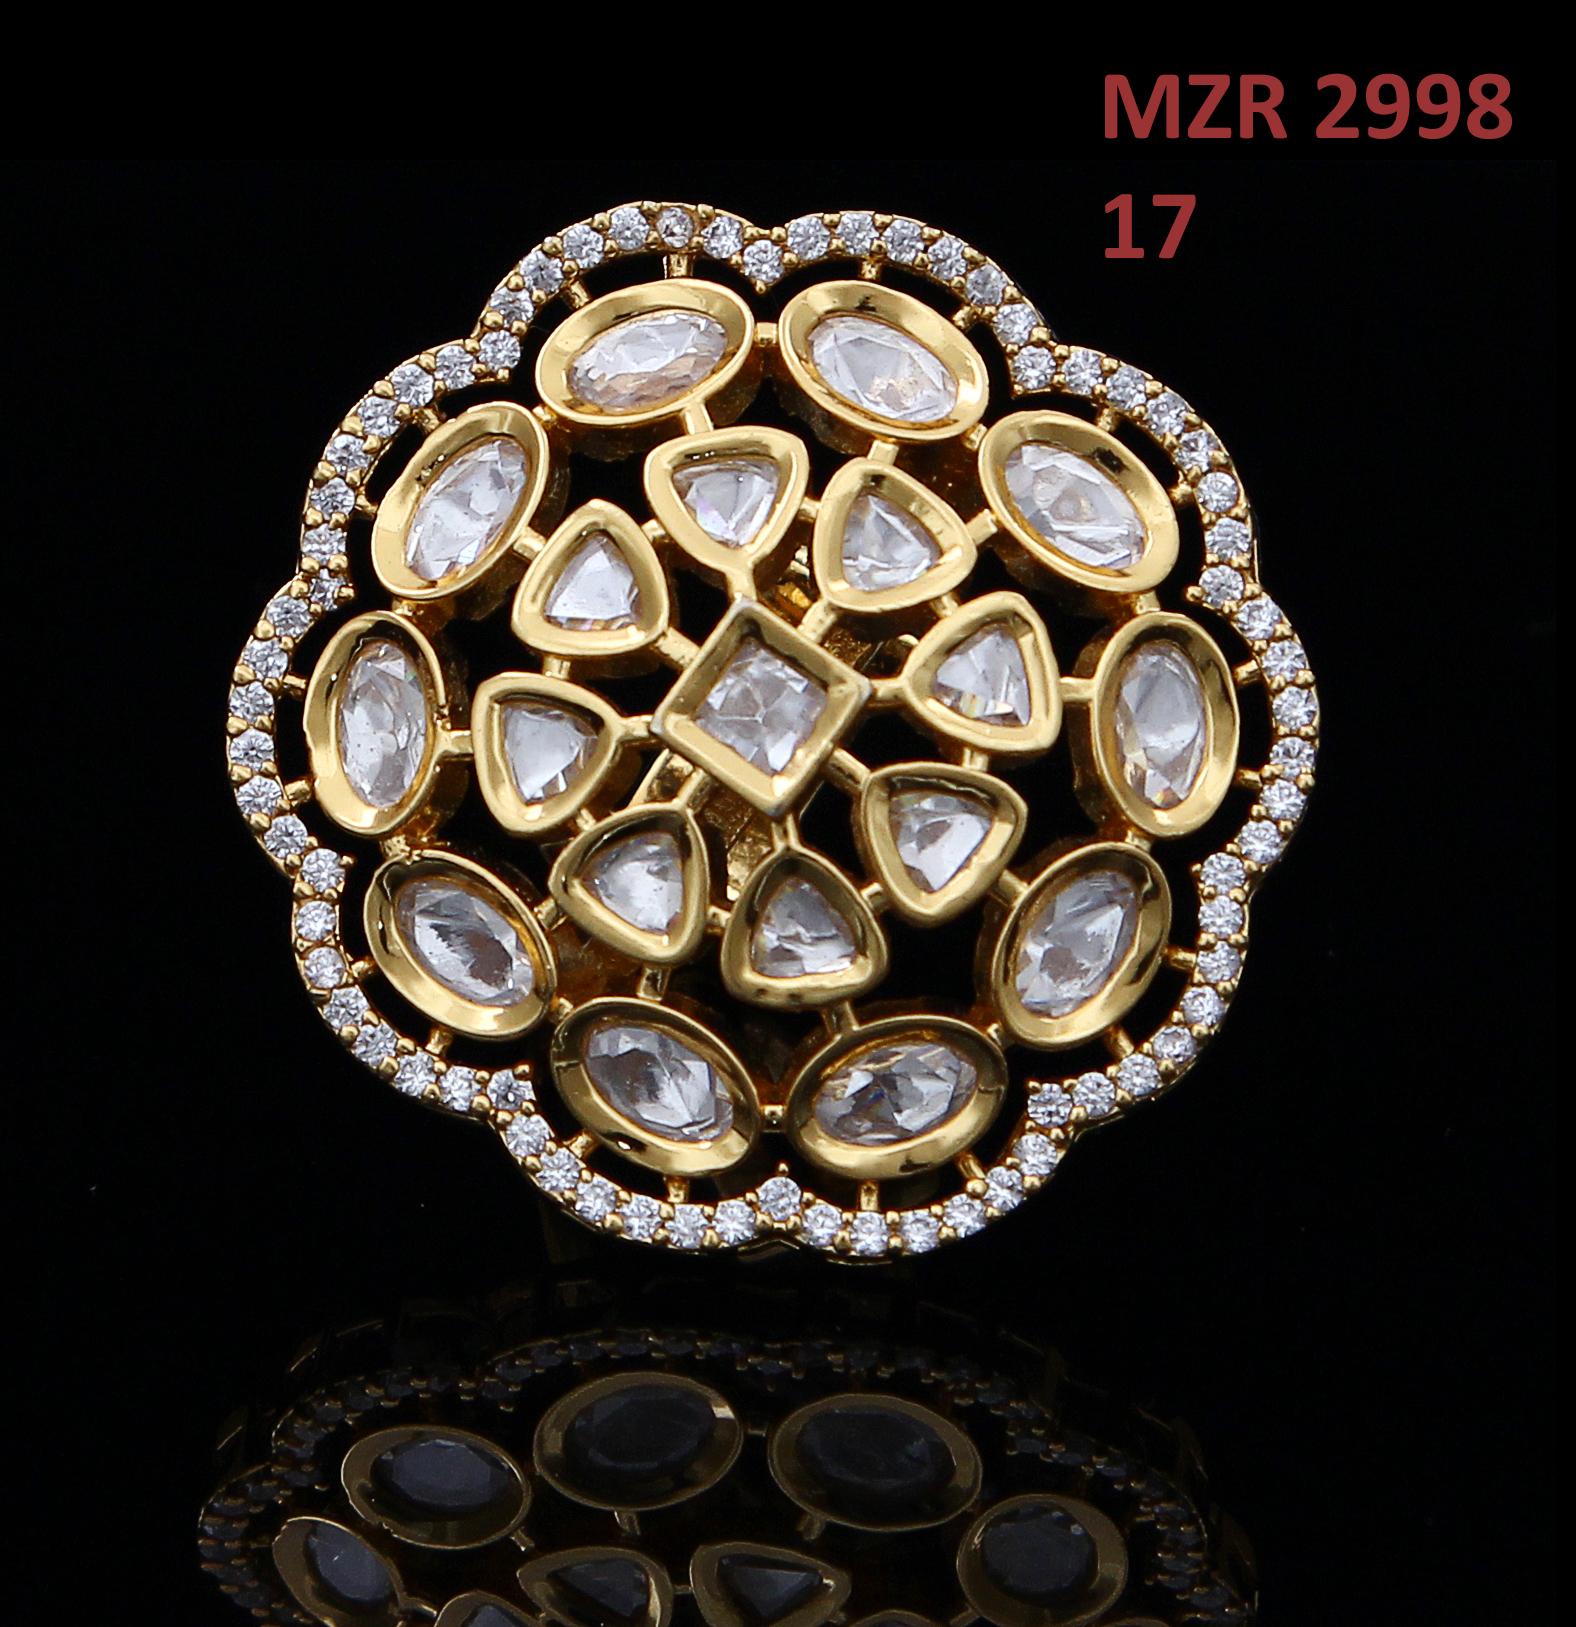 55Carat | 55Carat Ethnic Polki Ring 18K Gold Plated Kundan, Cubic Zircon Floral Adjustable Designer Fashion Jewellery for Women and Girls